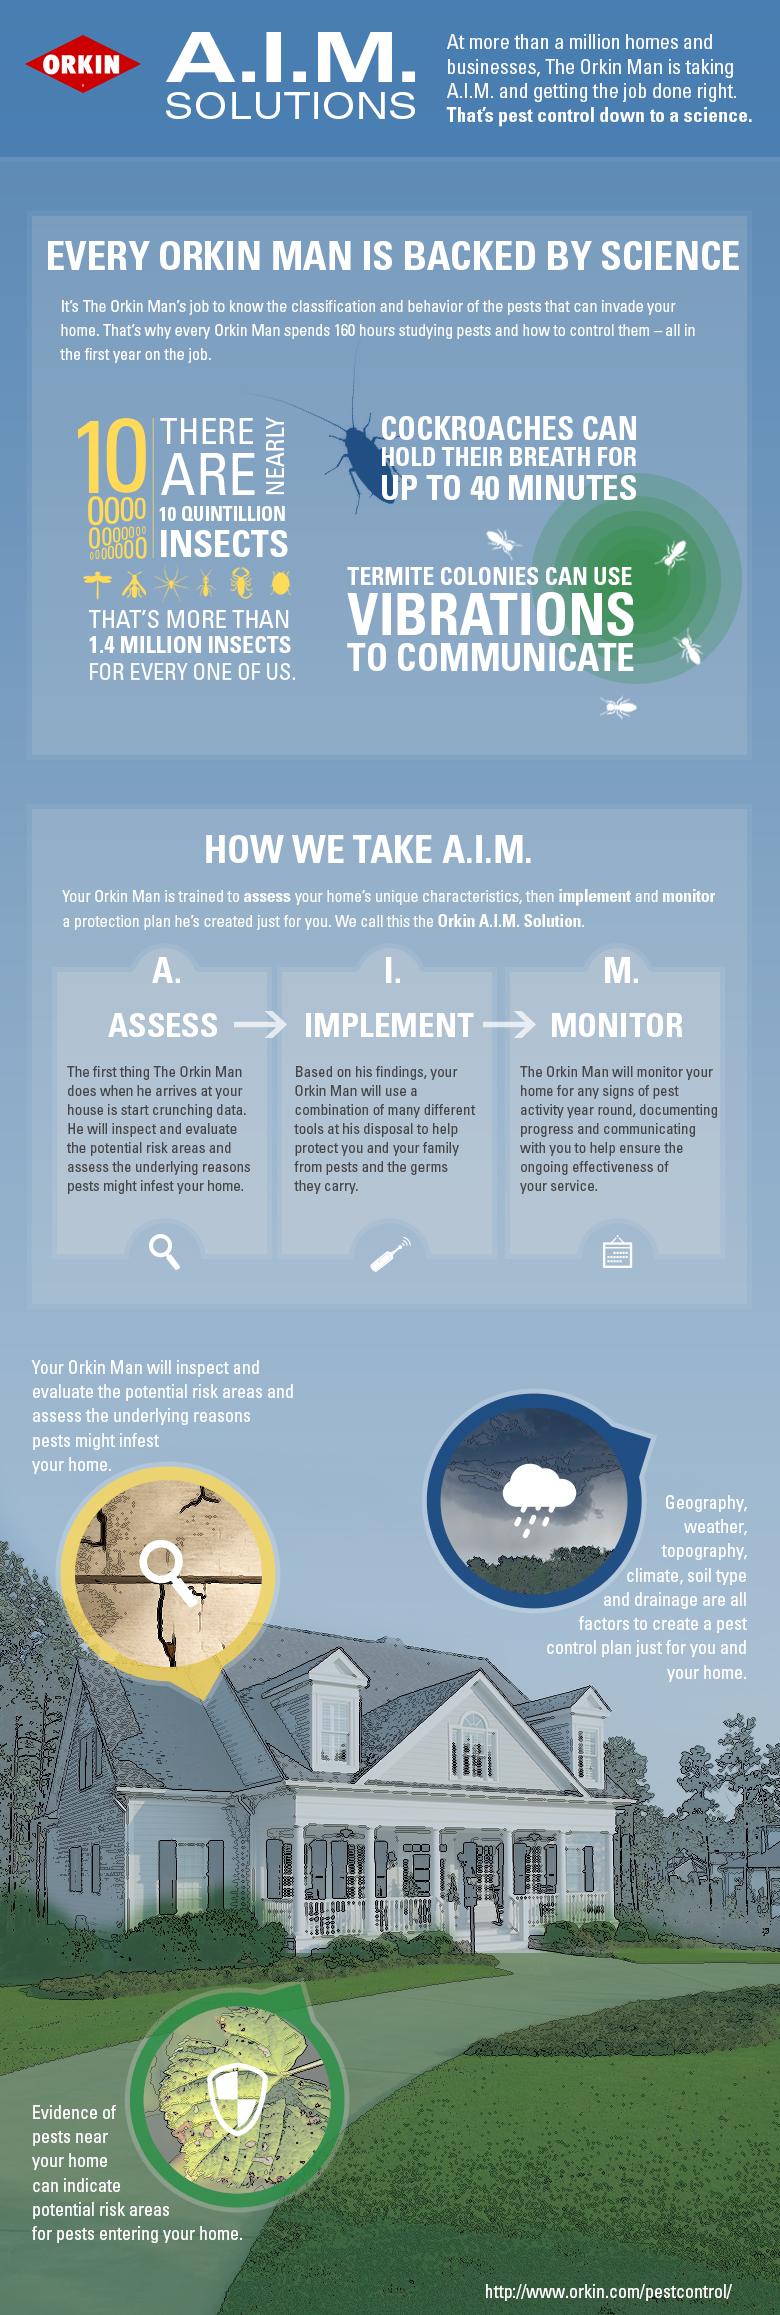 AIM_Infographic_V7